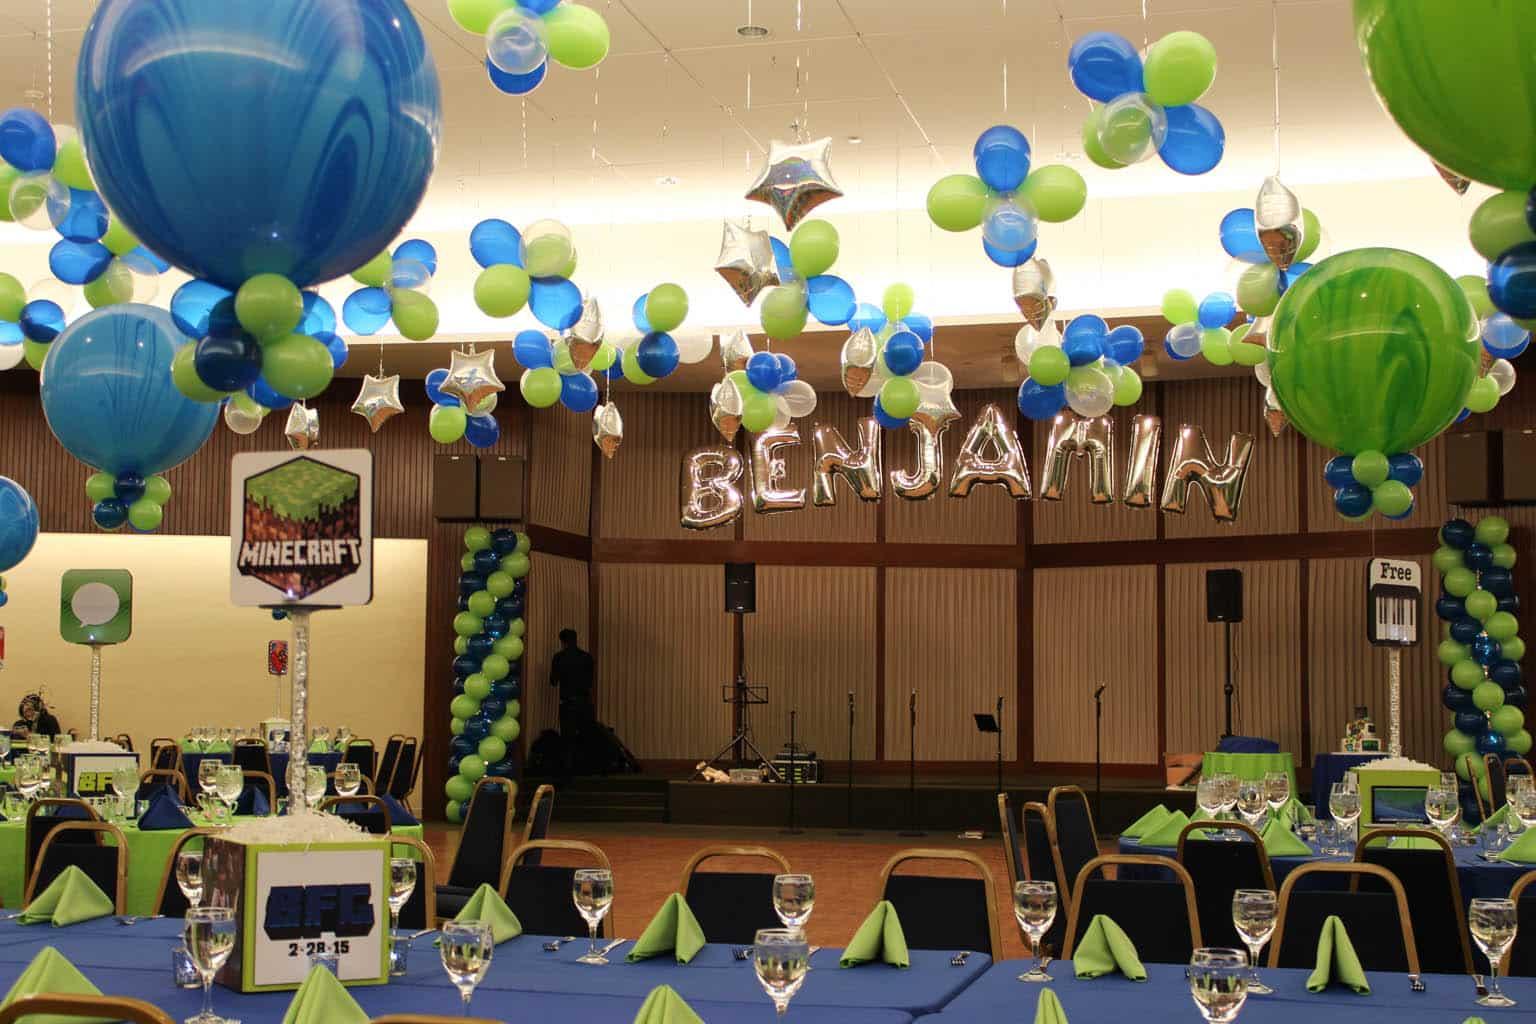 Mylar names in balloons balloon artistry